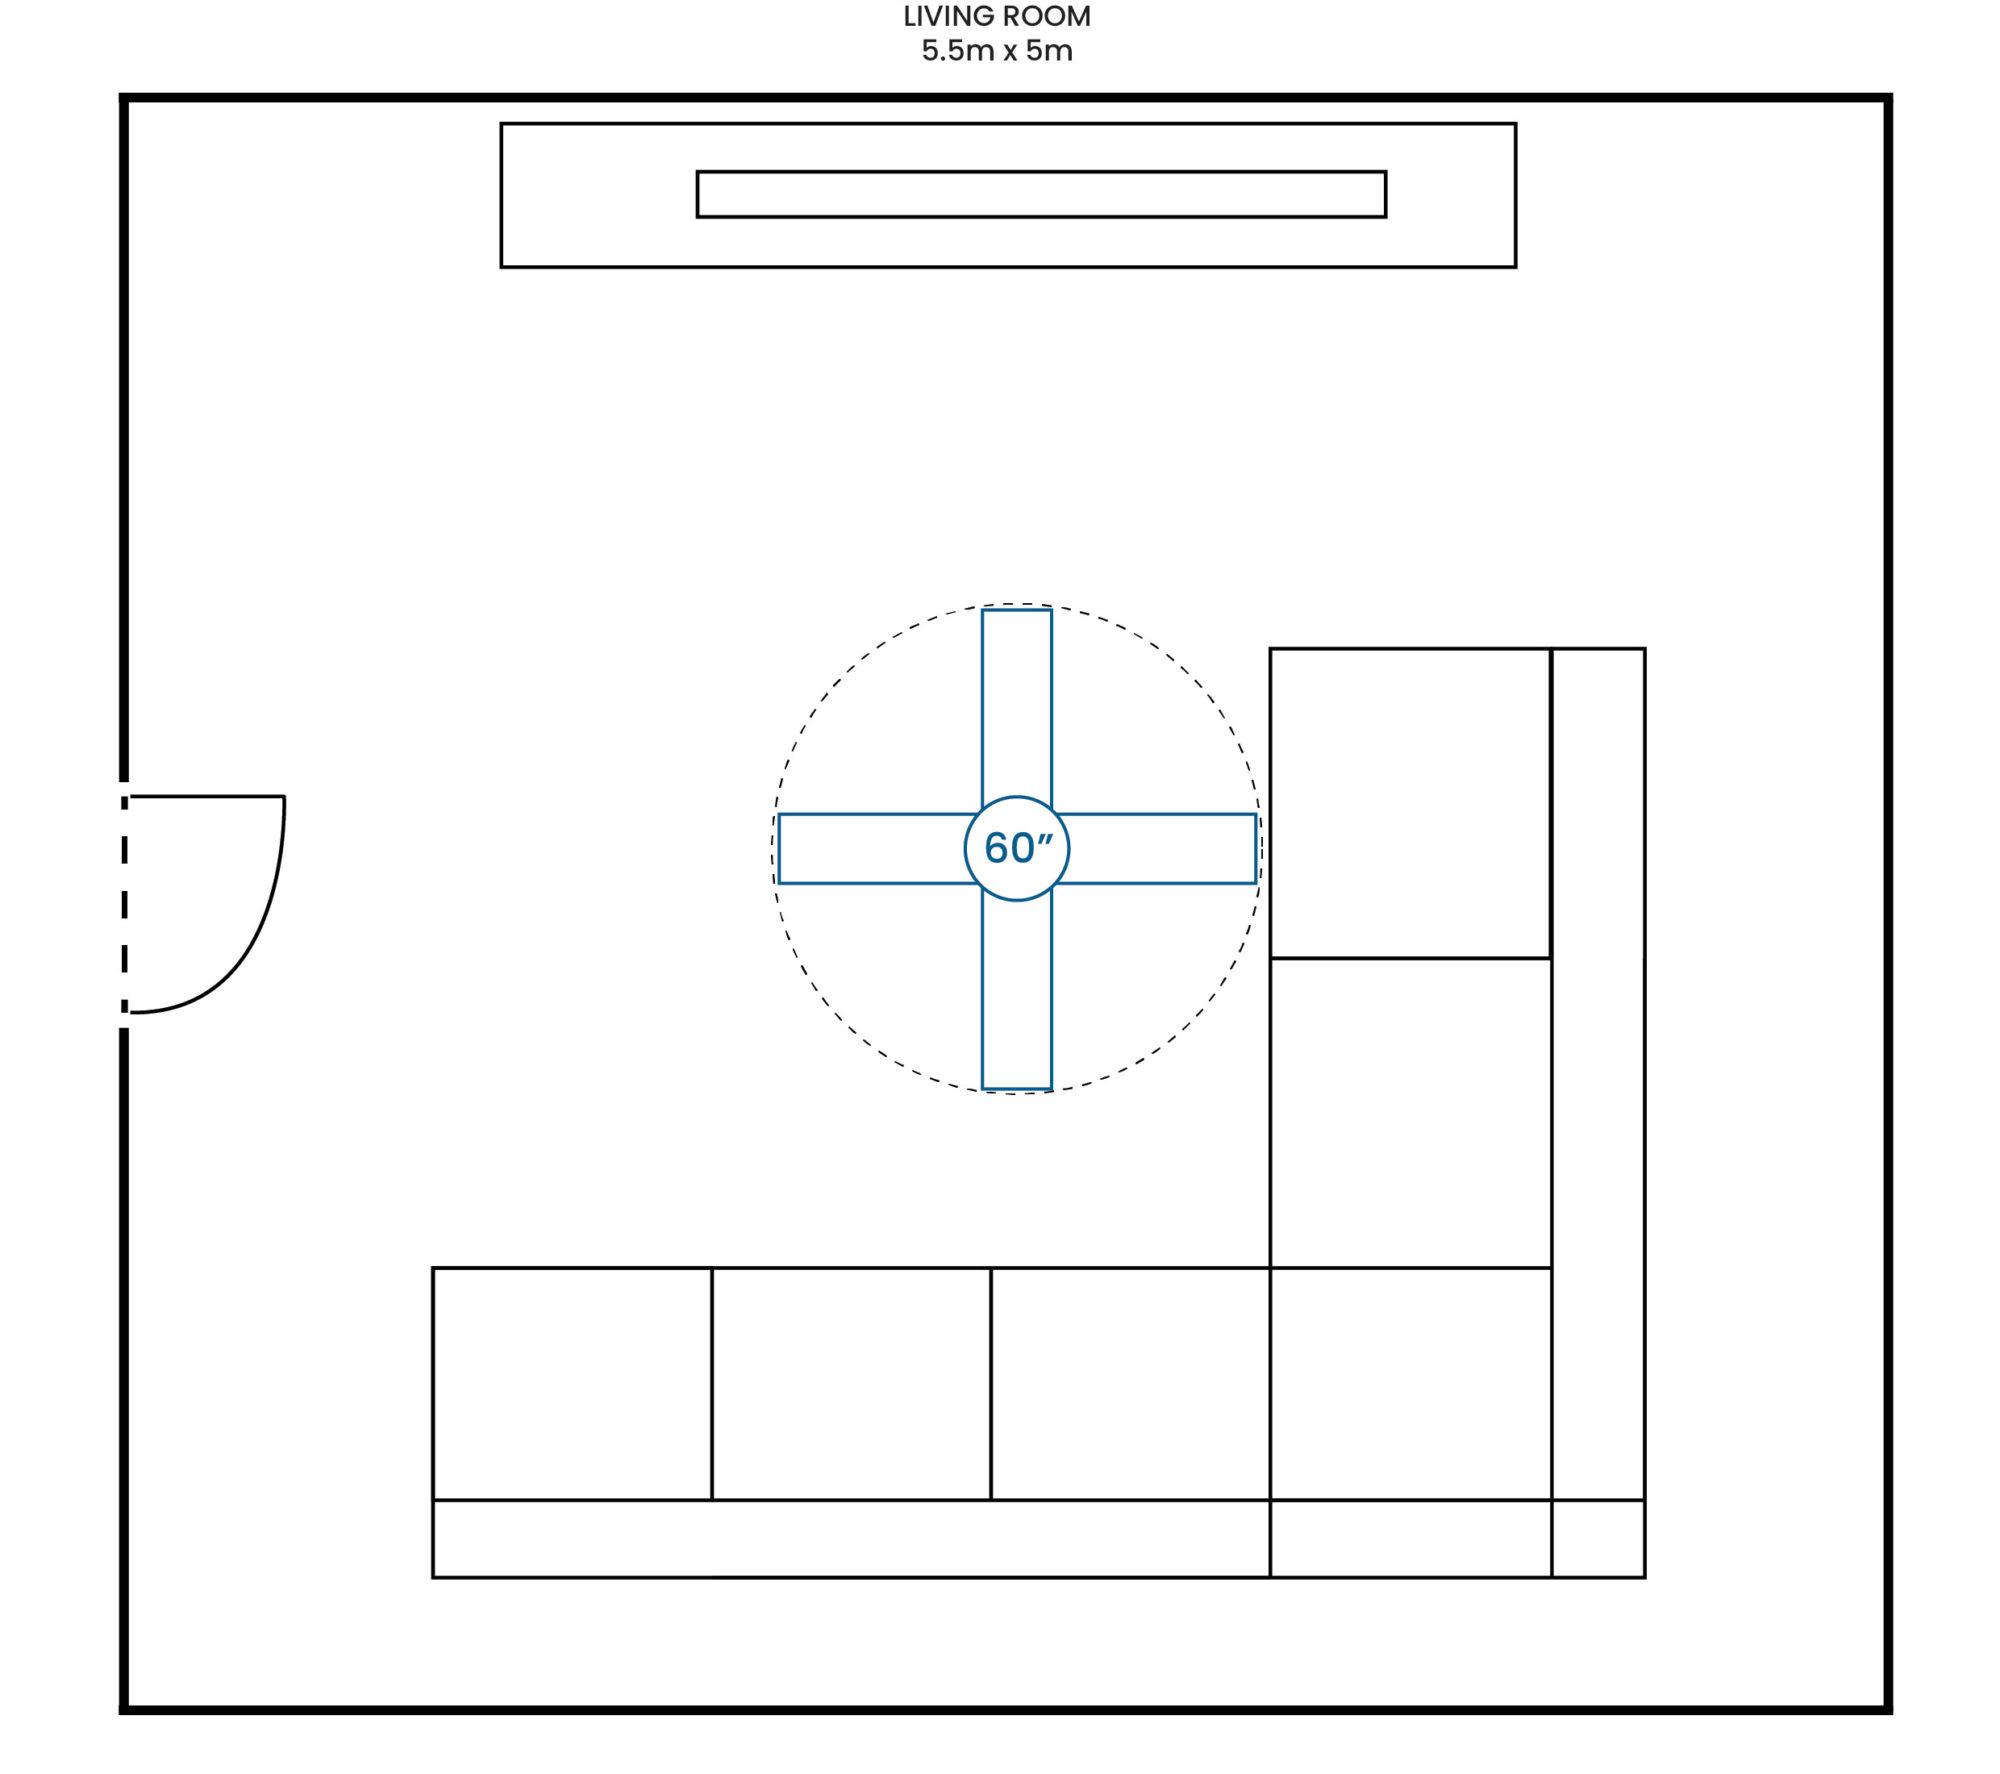 Living Room 550 500 60F